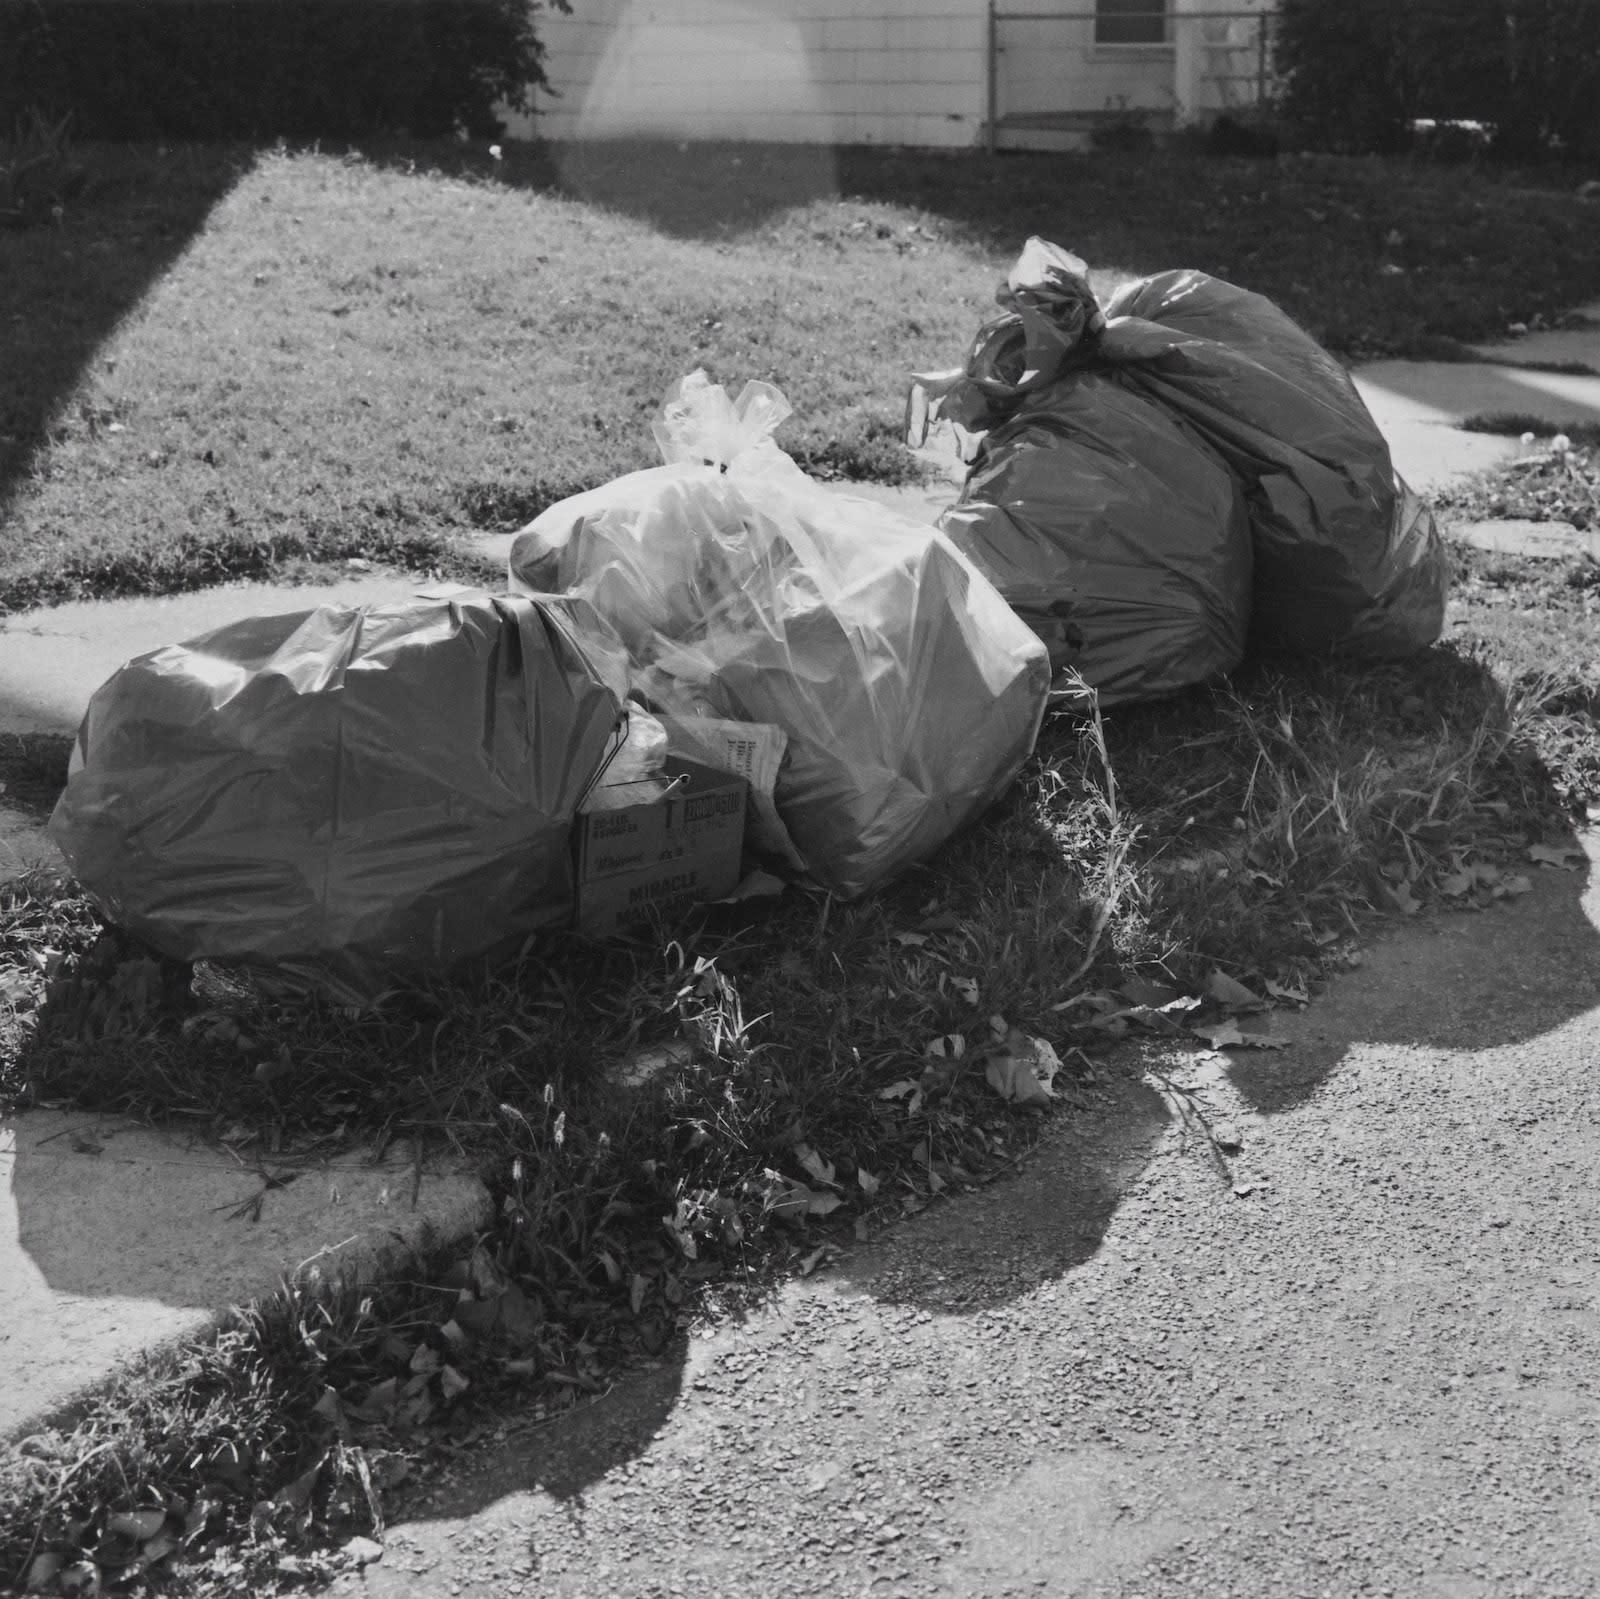 Steven Rifkin, Untitled, Kansas City, MO, 1975